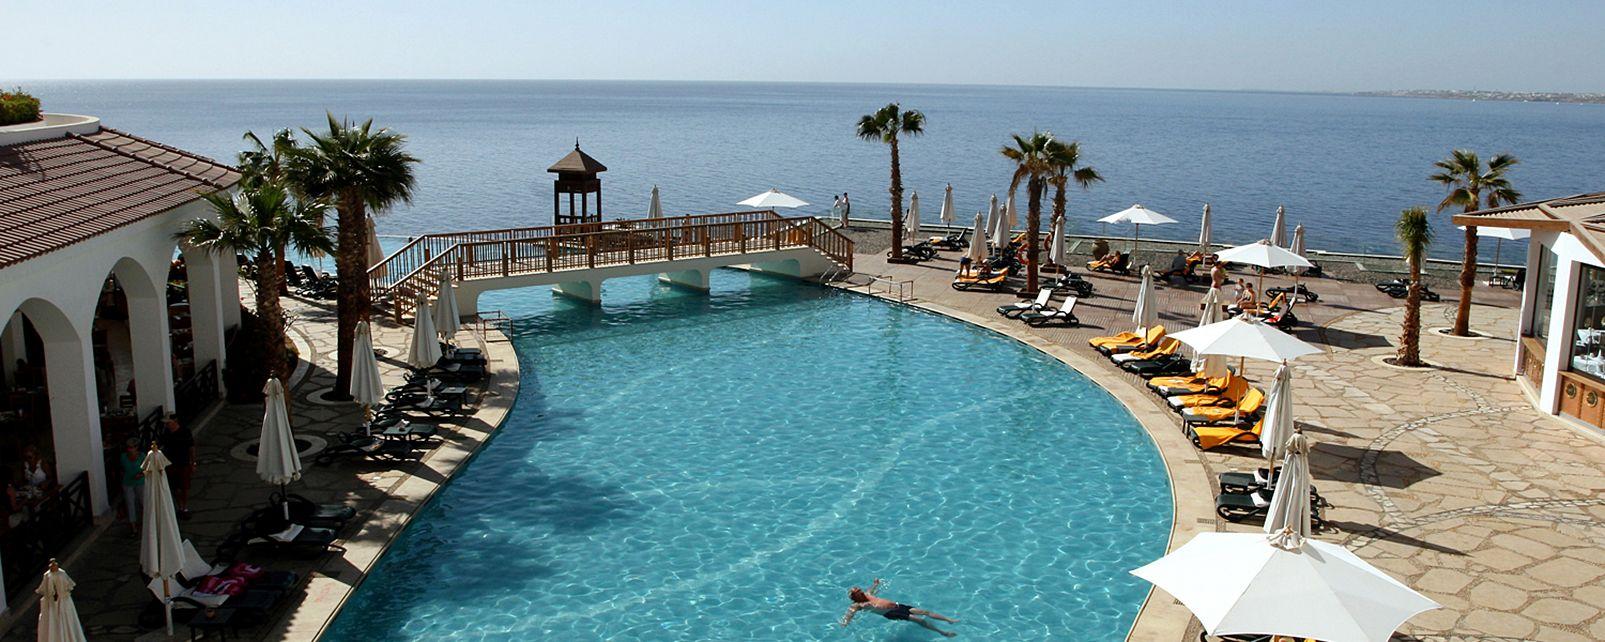 Hôtel Blue Bay Resort